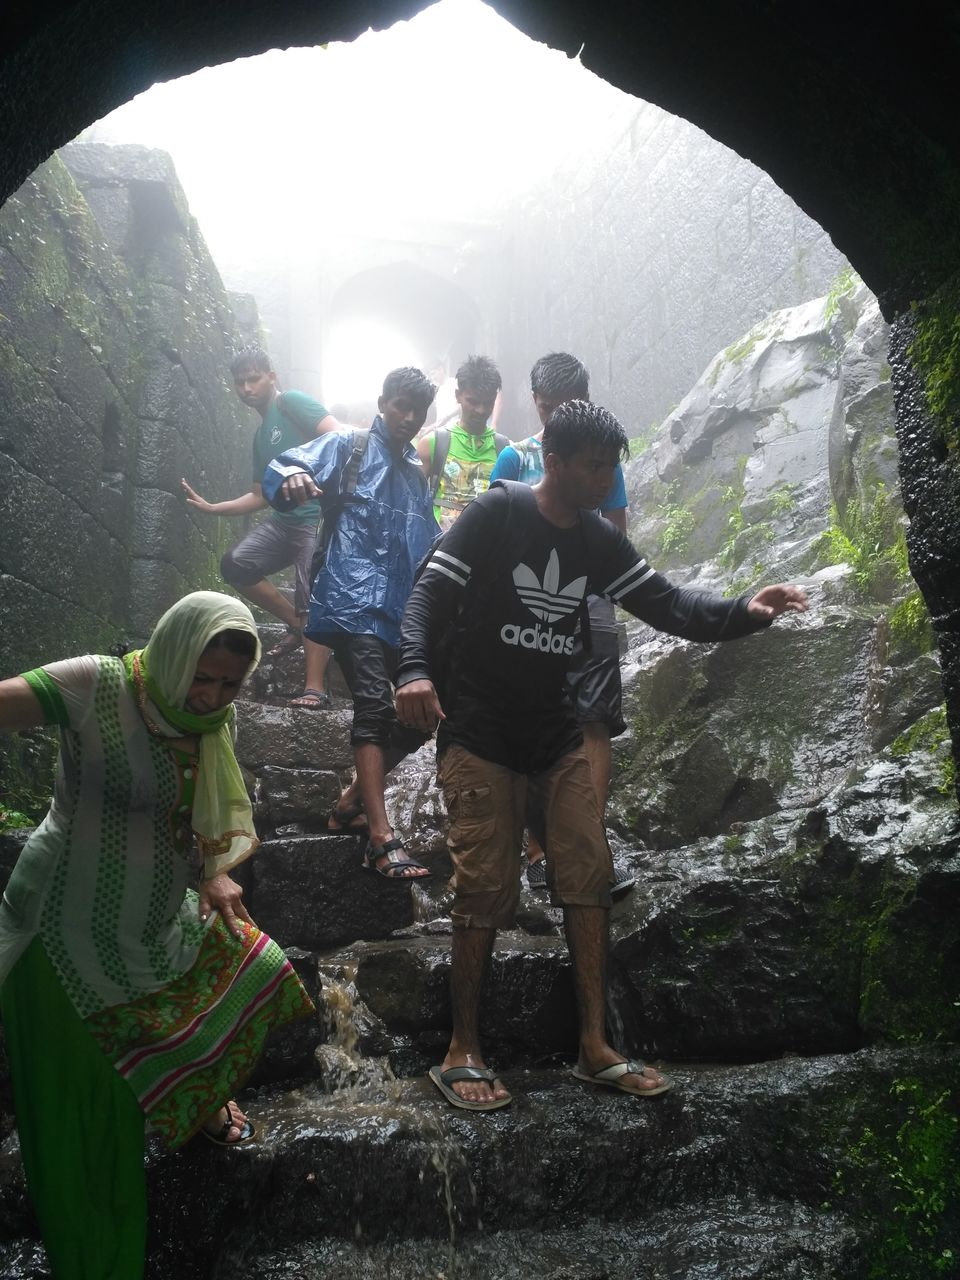 Photos of Lohagad Monsoon Trek - A must do! 6/17 by Prahlad Raj